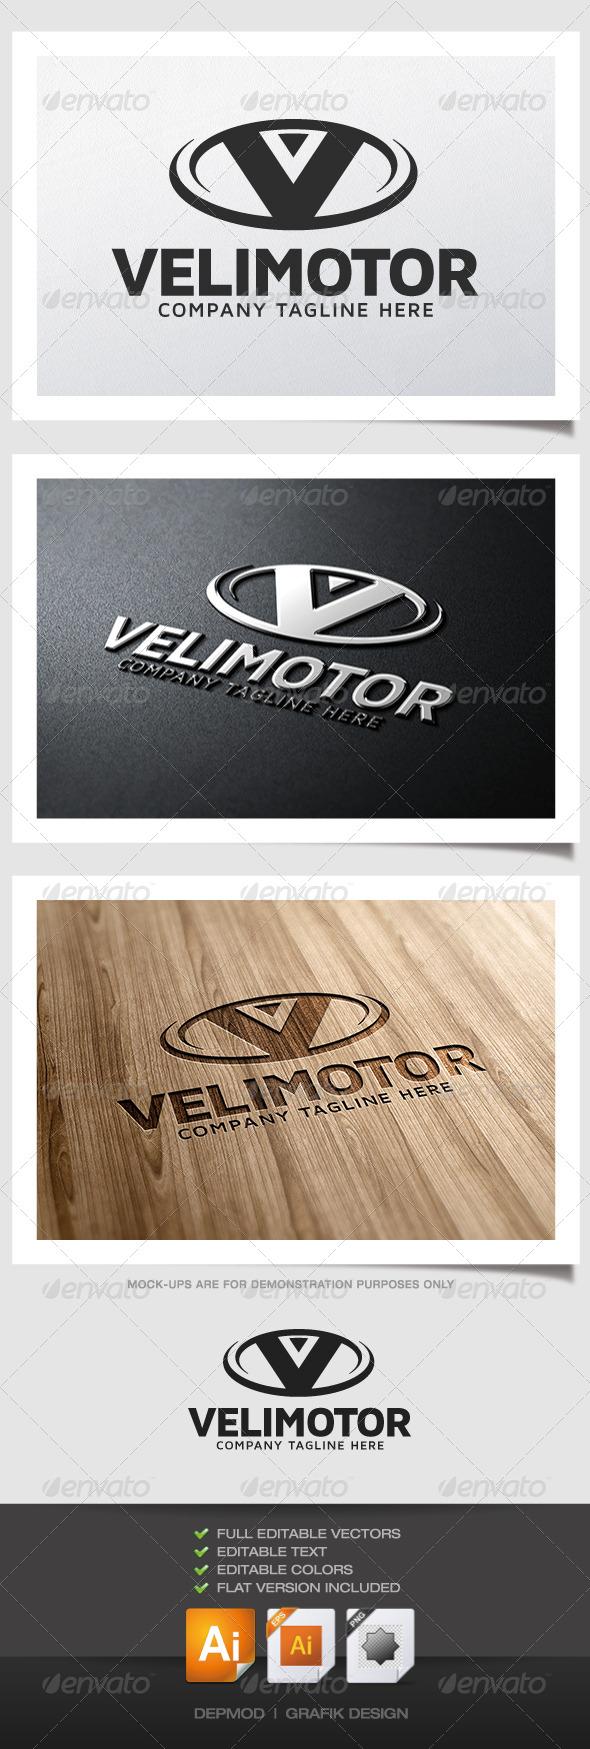 GraphicRiver Velimotor Logo 5016750